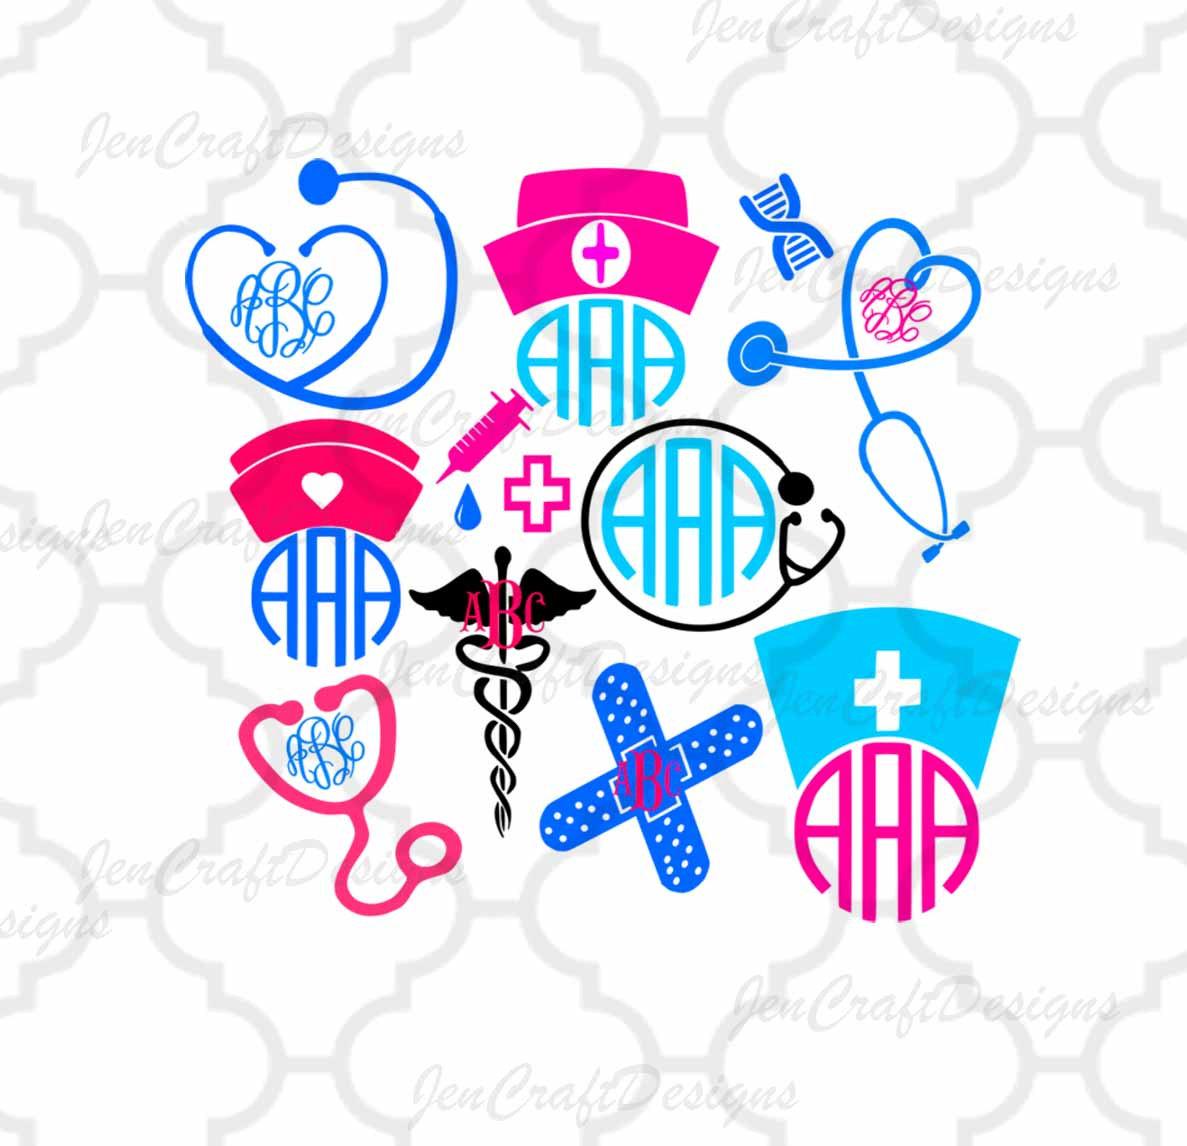 1187x1146 Nurse Svg Stethoscope Svg Nursing Svg Eps Png Dxf, Cut File Set